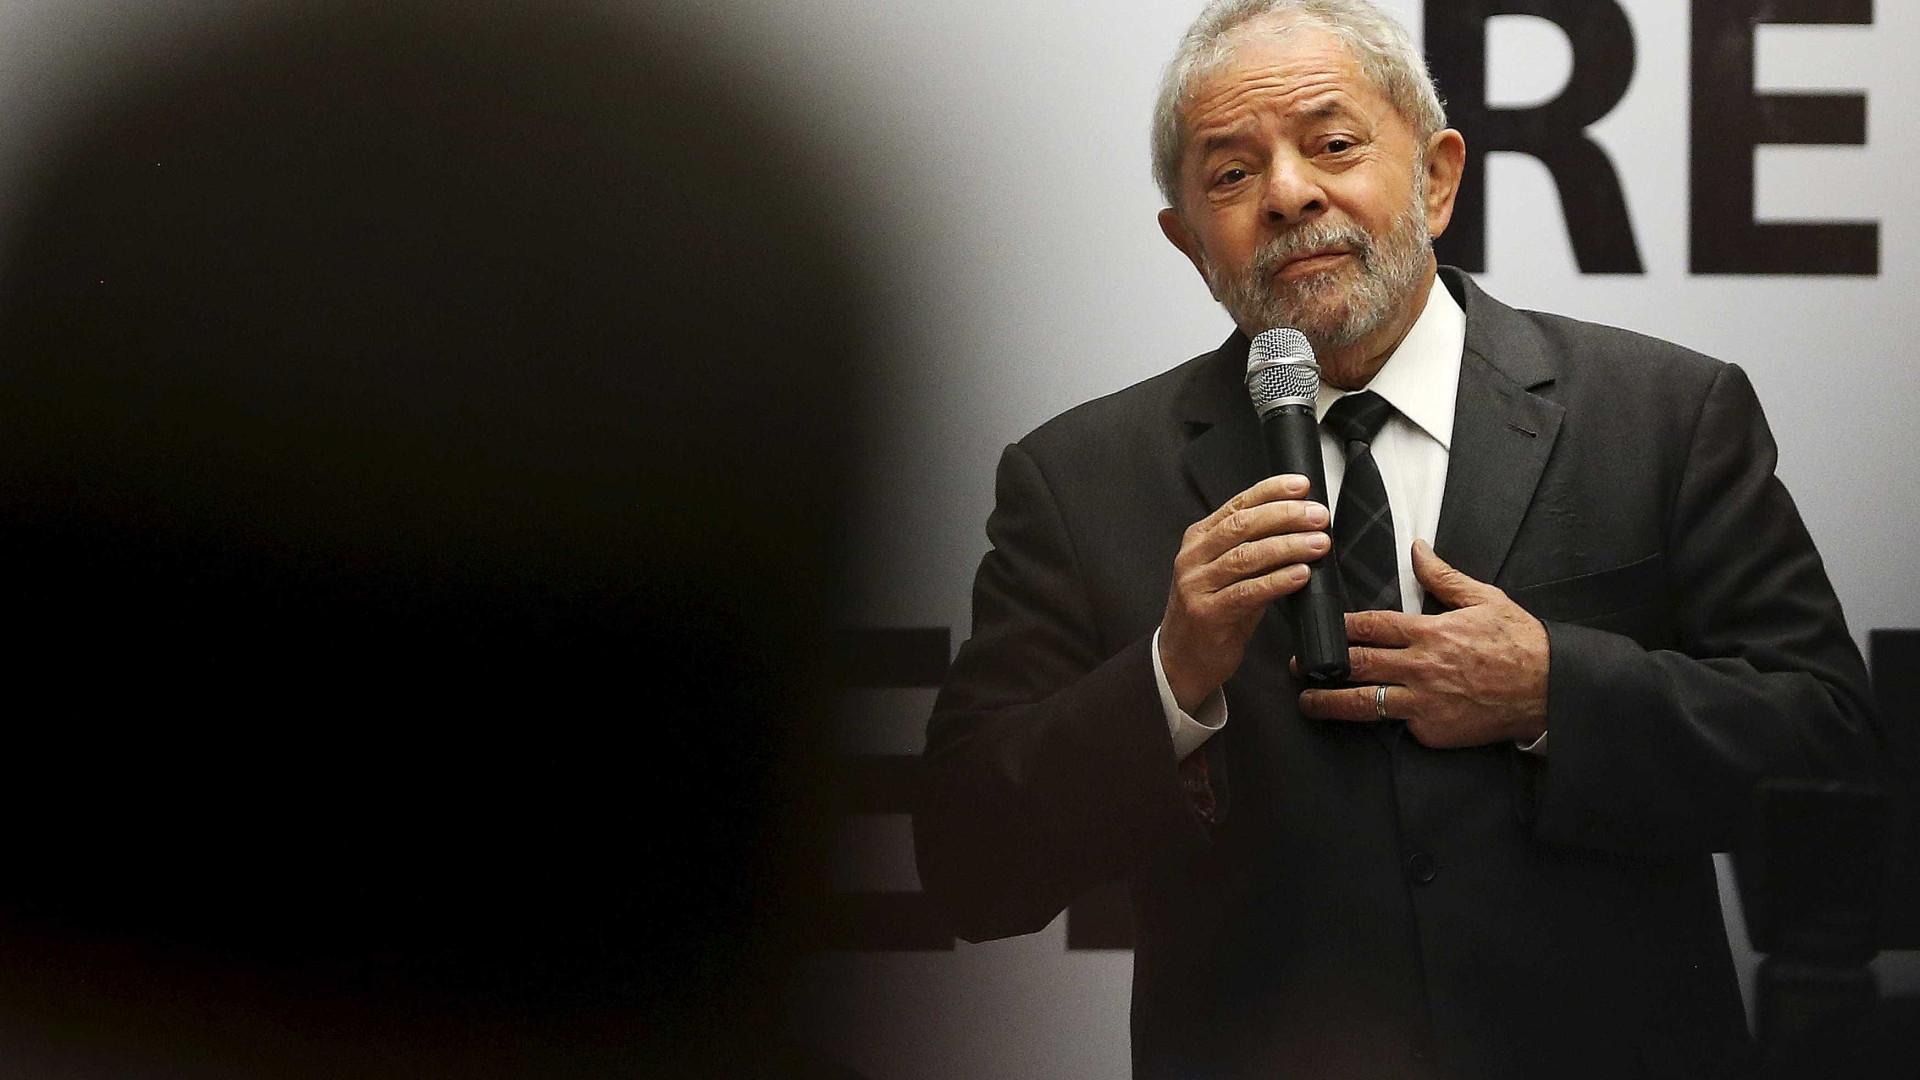 PT aconselha Lula a se reaproximar de empresários para se eleger